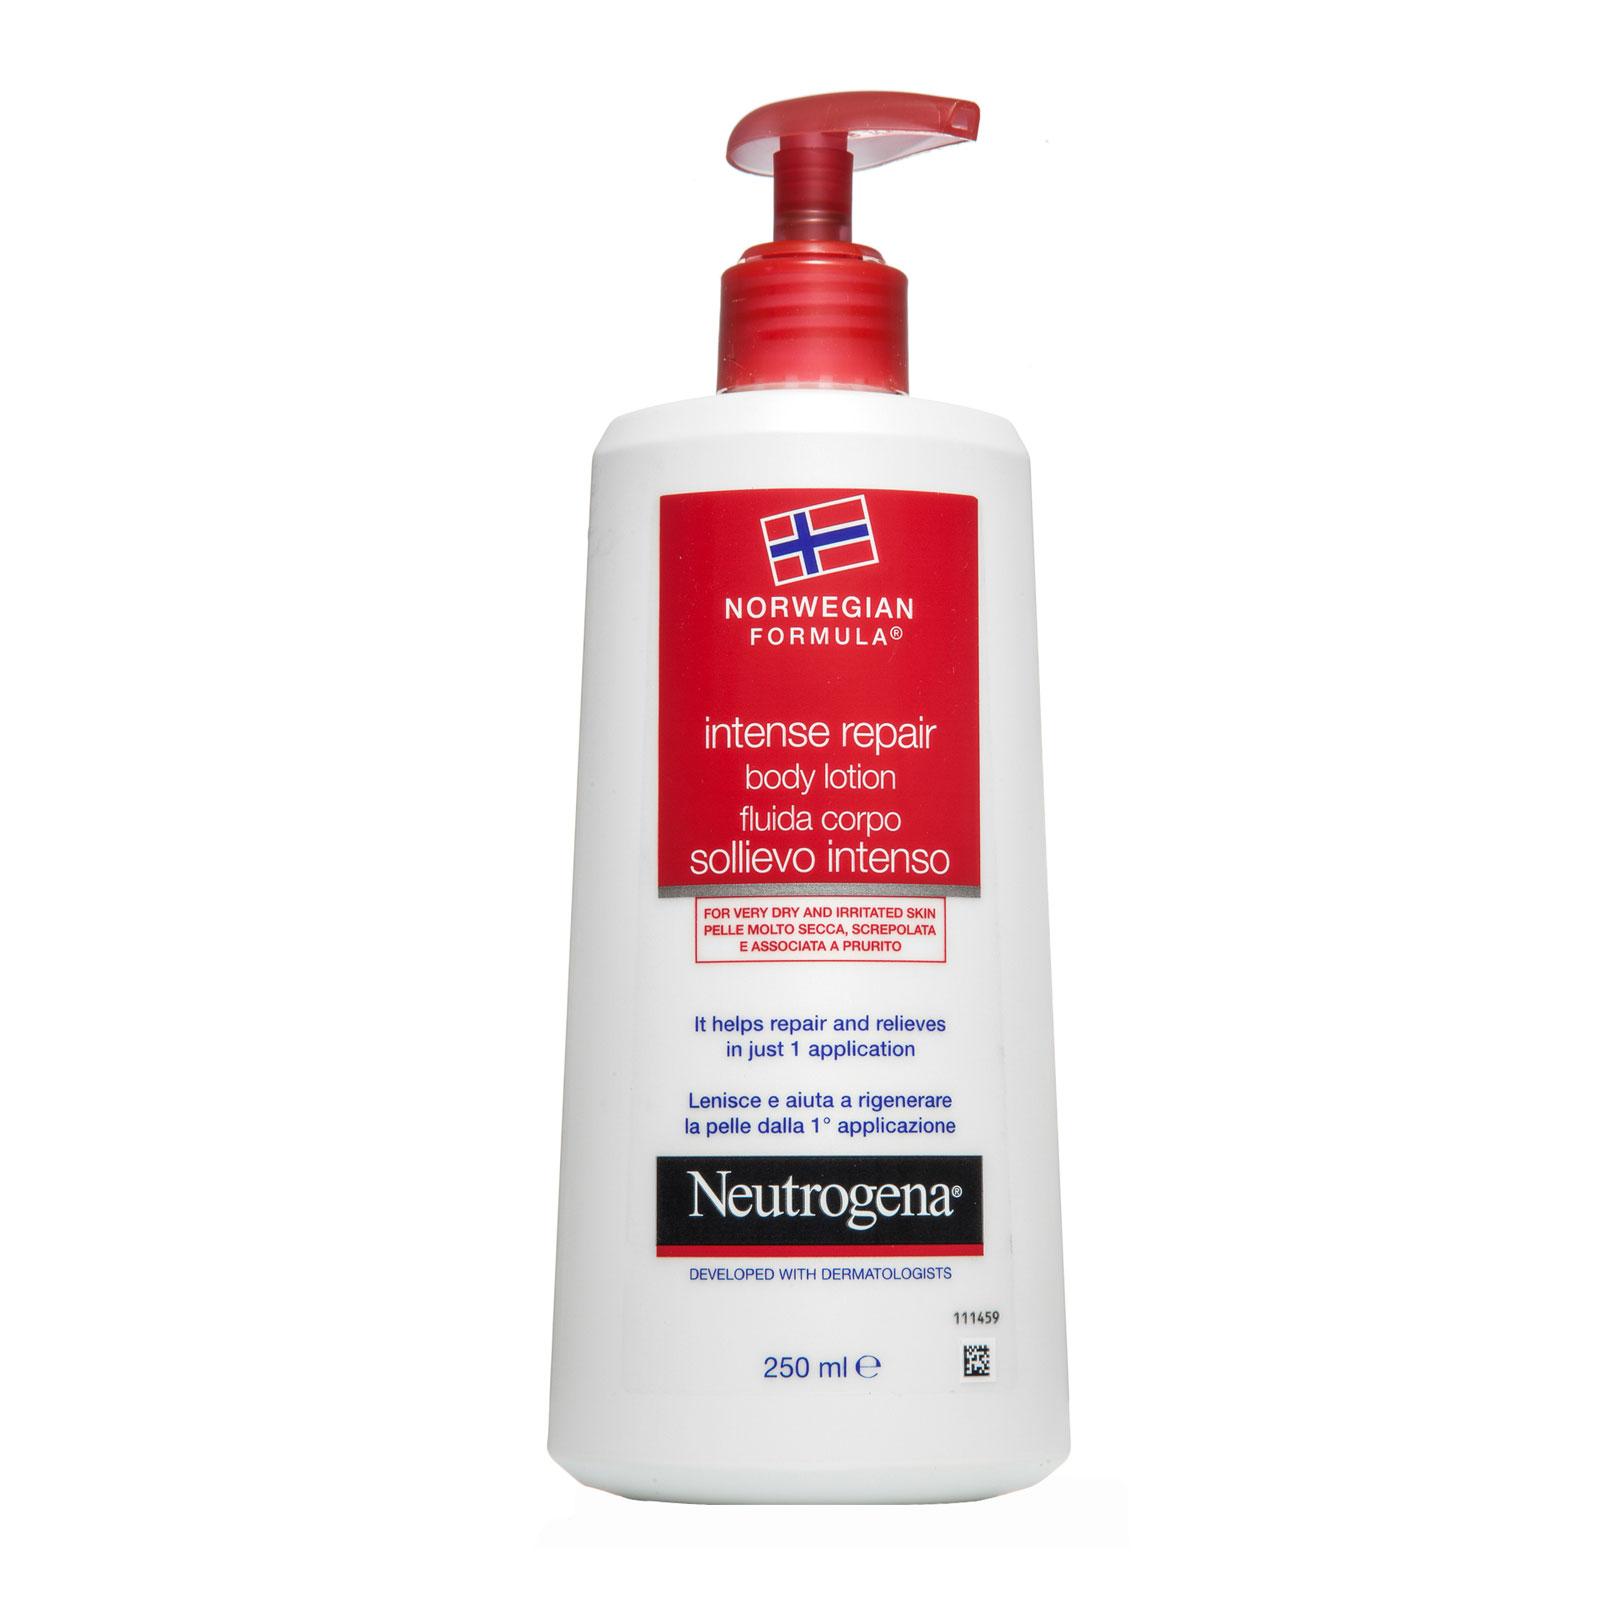 ������� ��� ���� Neutrogena ���������� ������� ����������� �������������� 250 ��